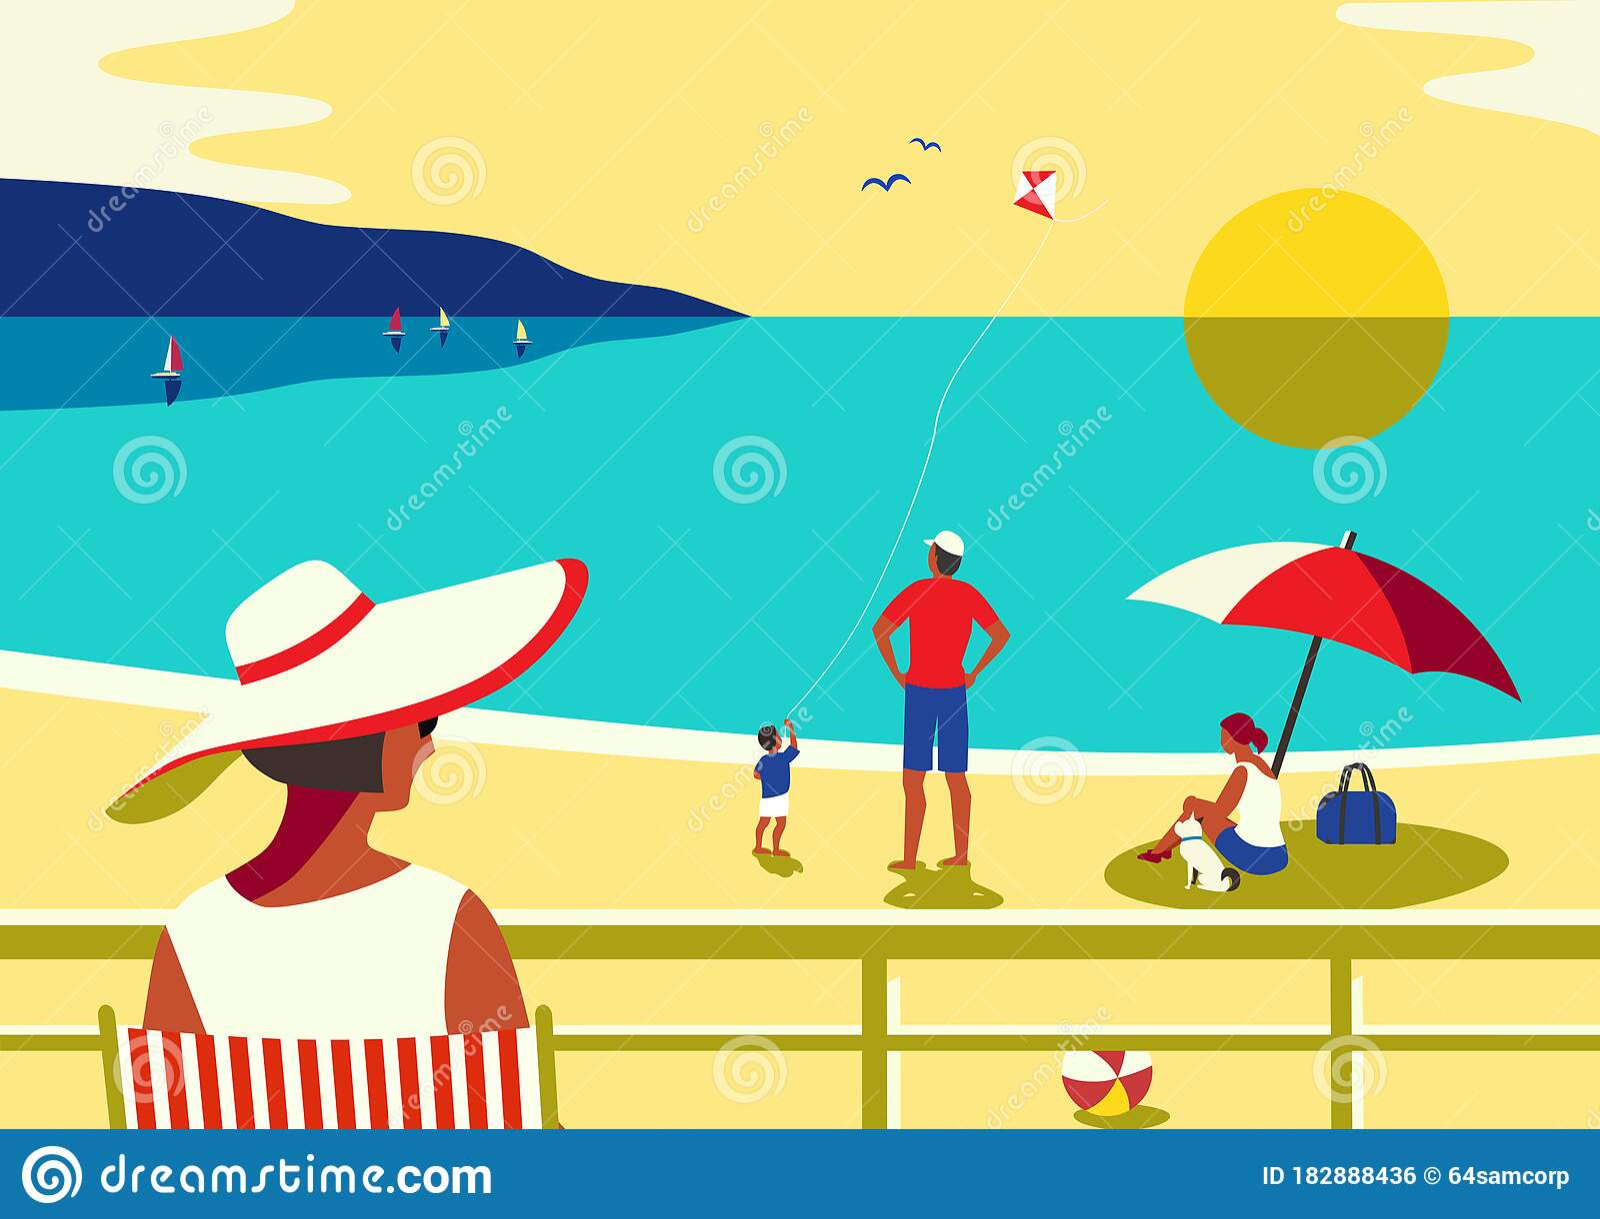 Family Seaside Leisure Relax On Beach Flat Vector Stock Vector Illustration Of Holiday Enjoy 182888436